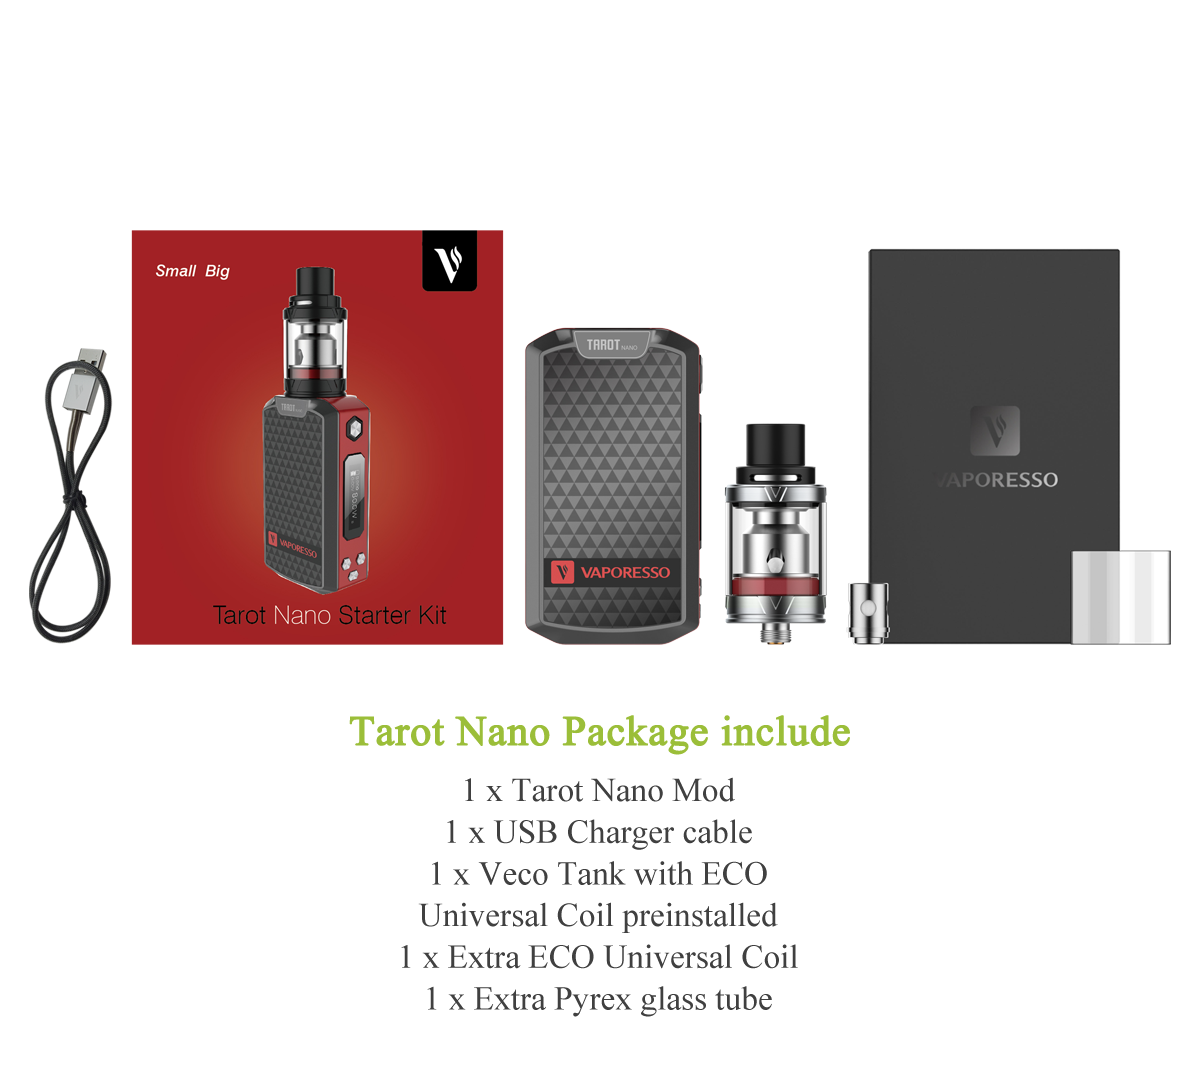 tarot_nano_kit_package_2.png